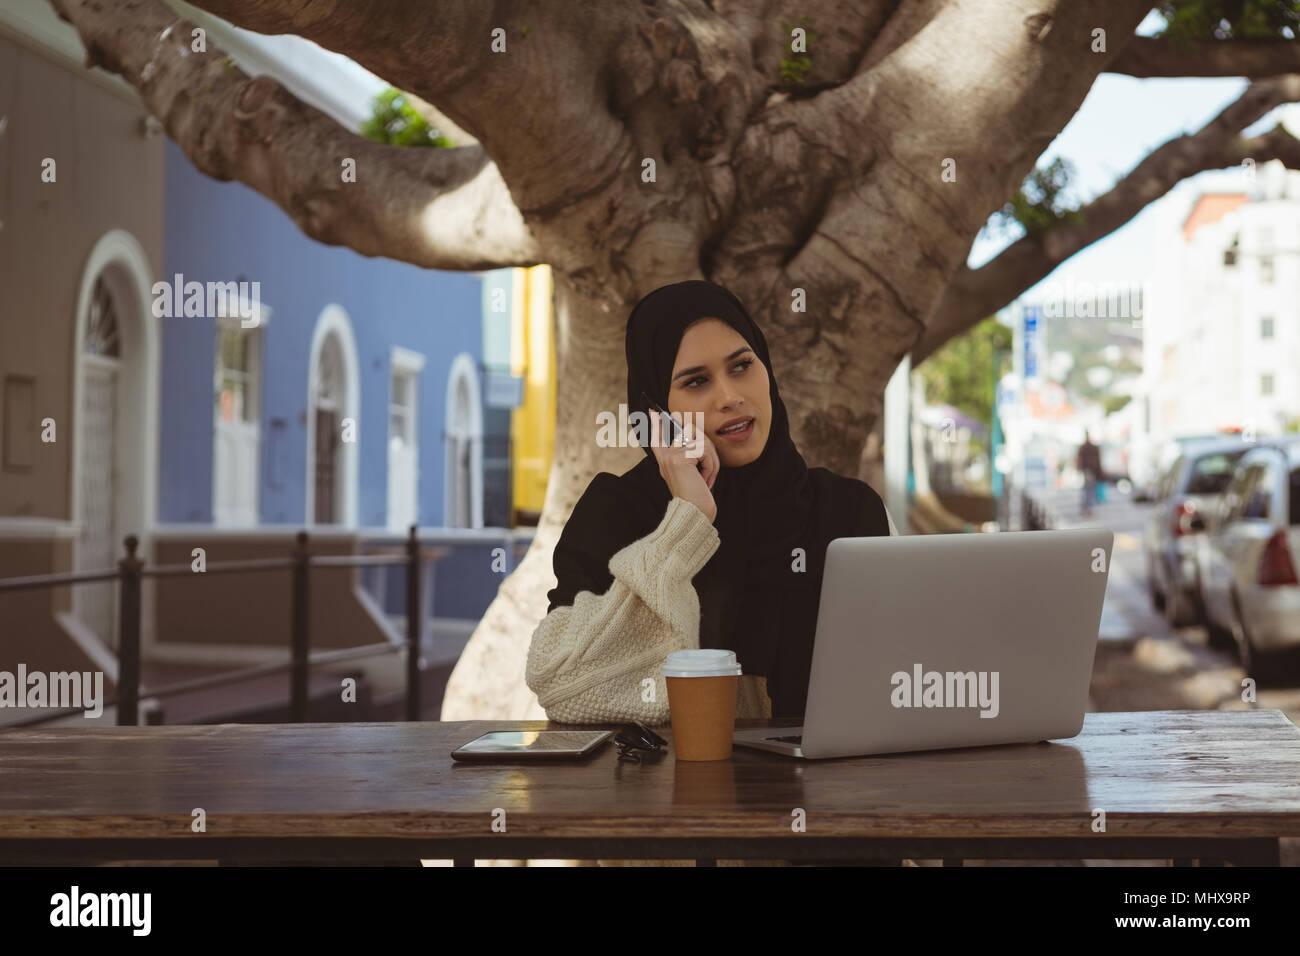 Urban hijab woman talking on mobile phone at cafe - Stock Image